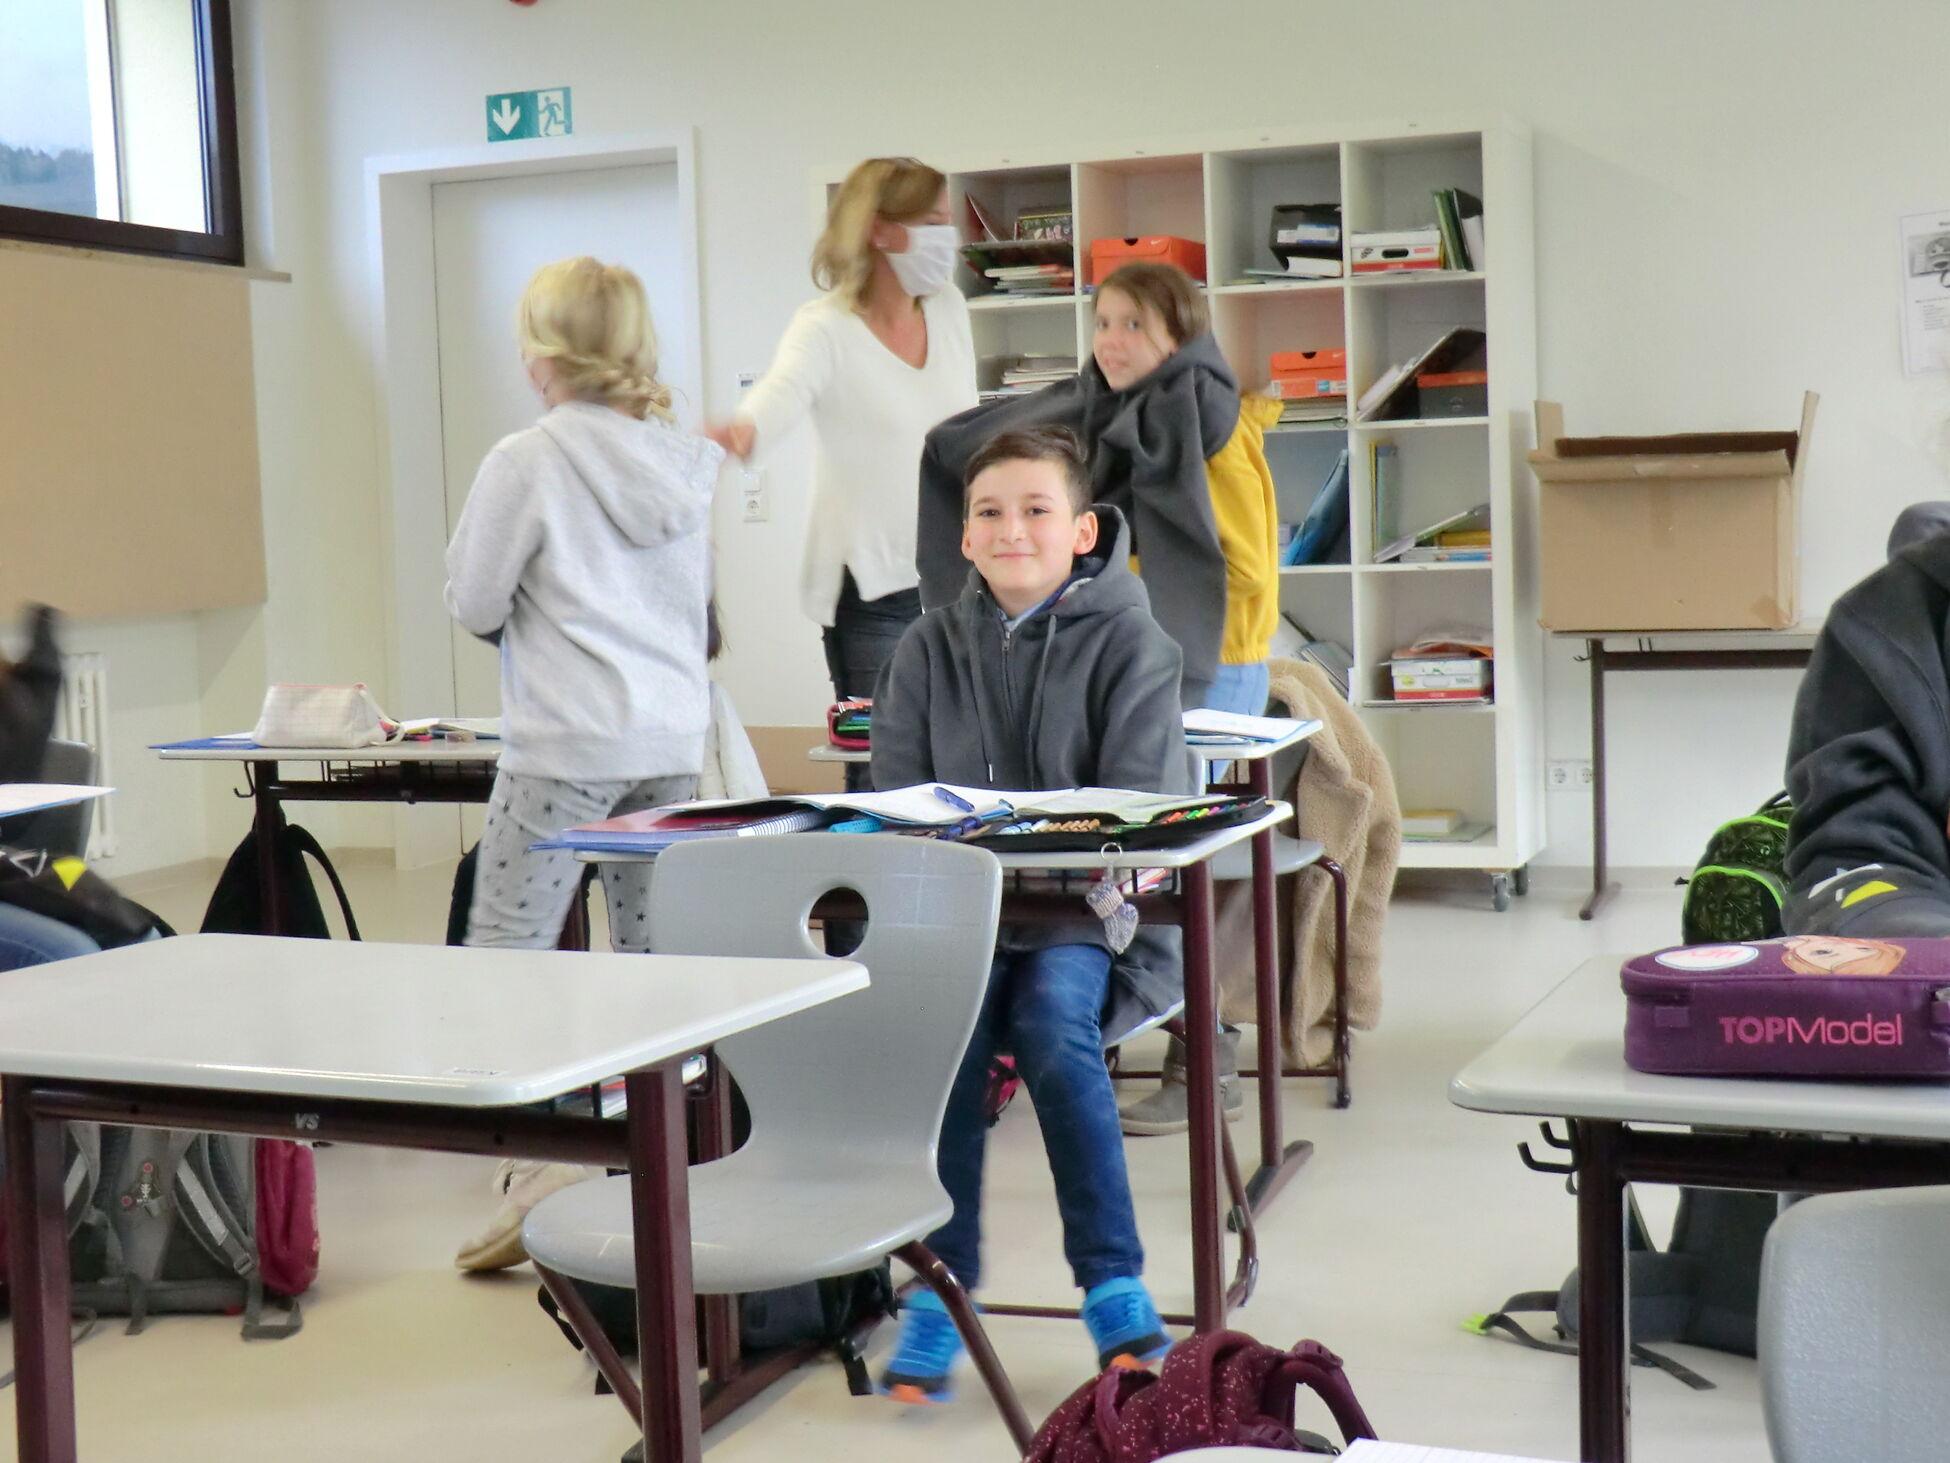 Schulkleidung - 5. Klasse I